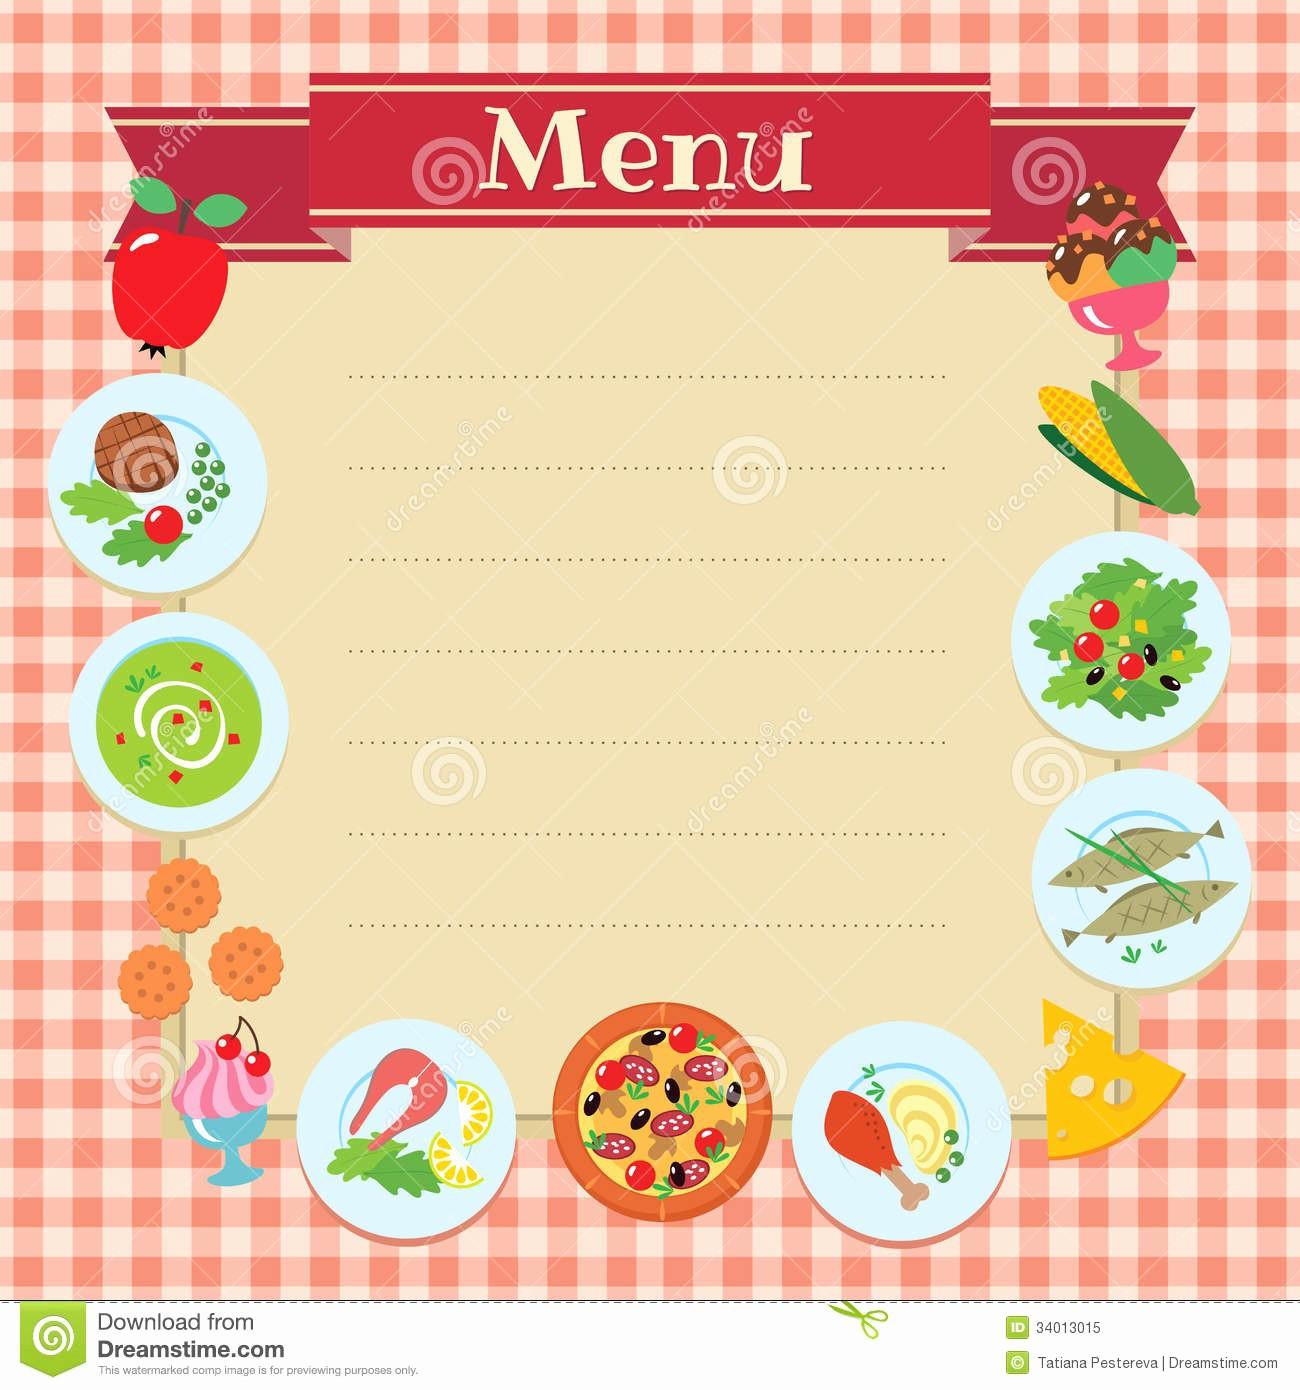 Menu Card Template Free Download New Cafe Restaurant Menu Template Stock Vector